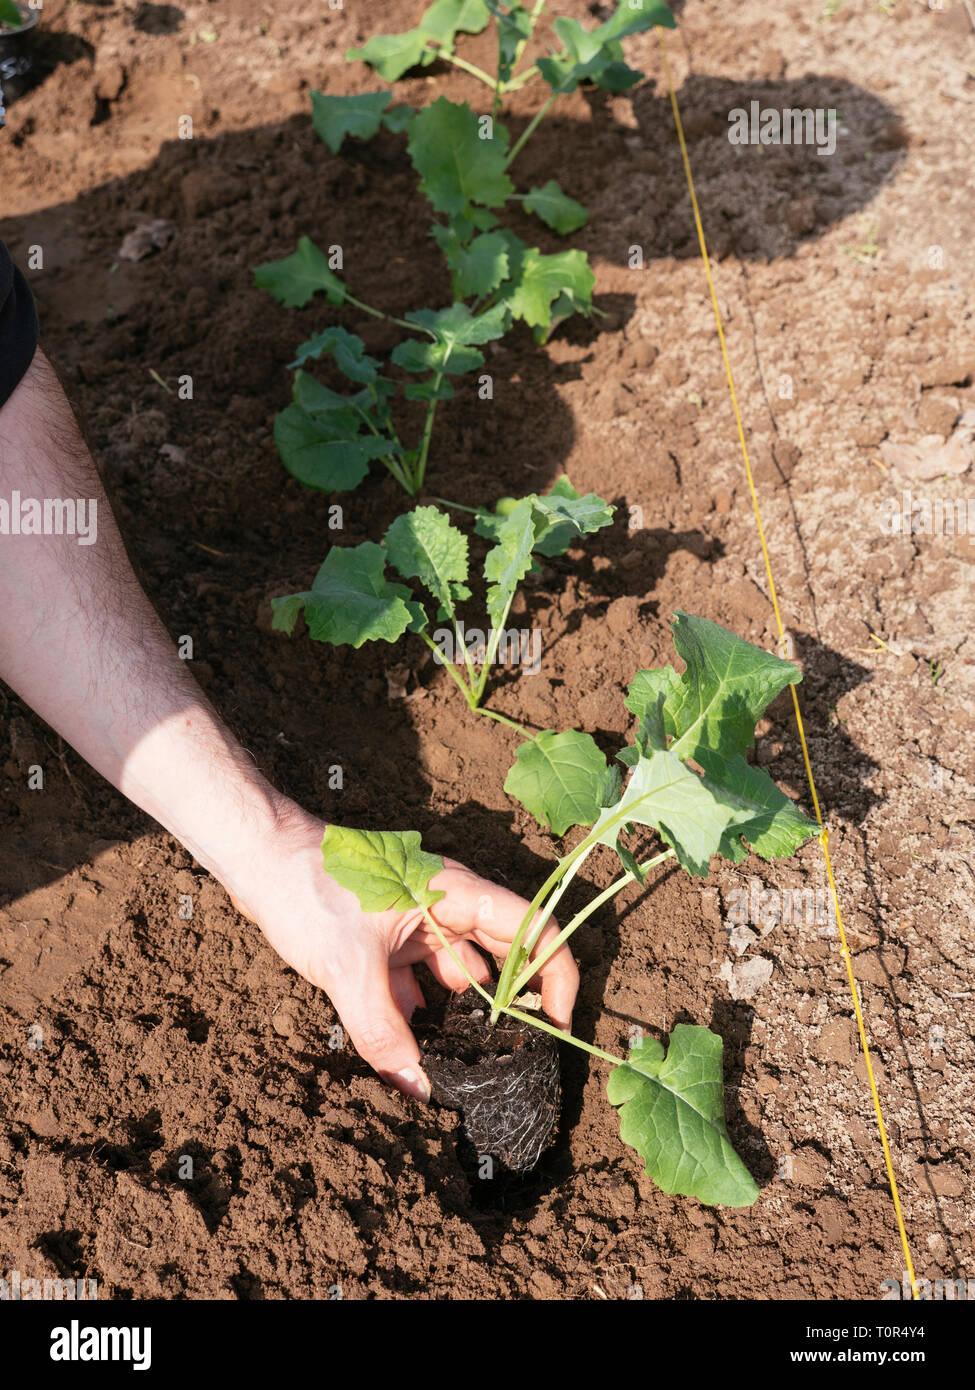 Siberian kale (Bremer Scheerkohl, brassica napus var. pabularia) seedlings being planted. Stock Photo